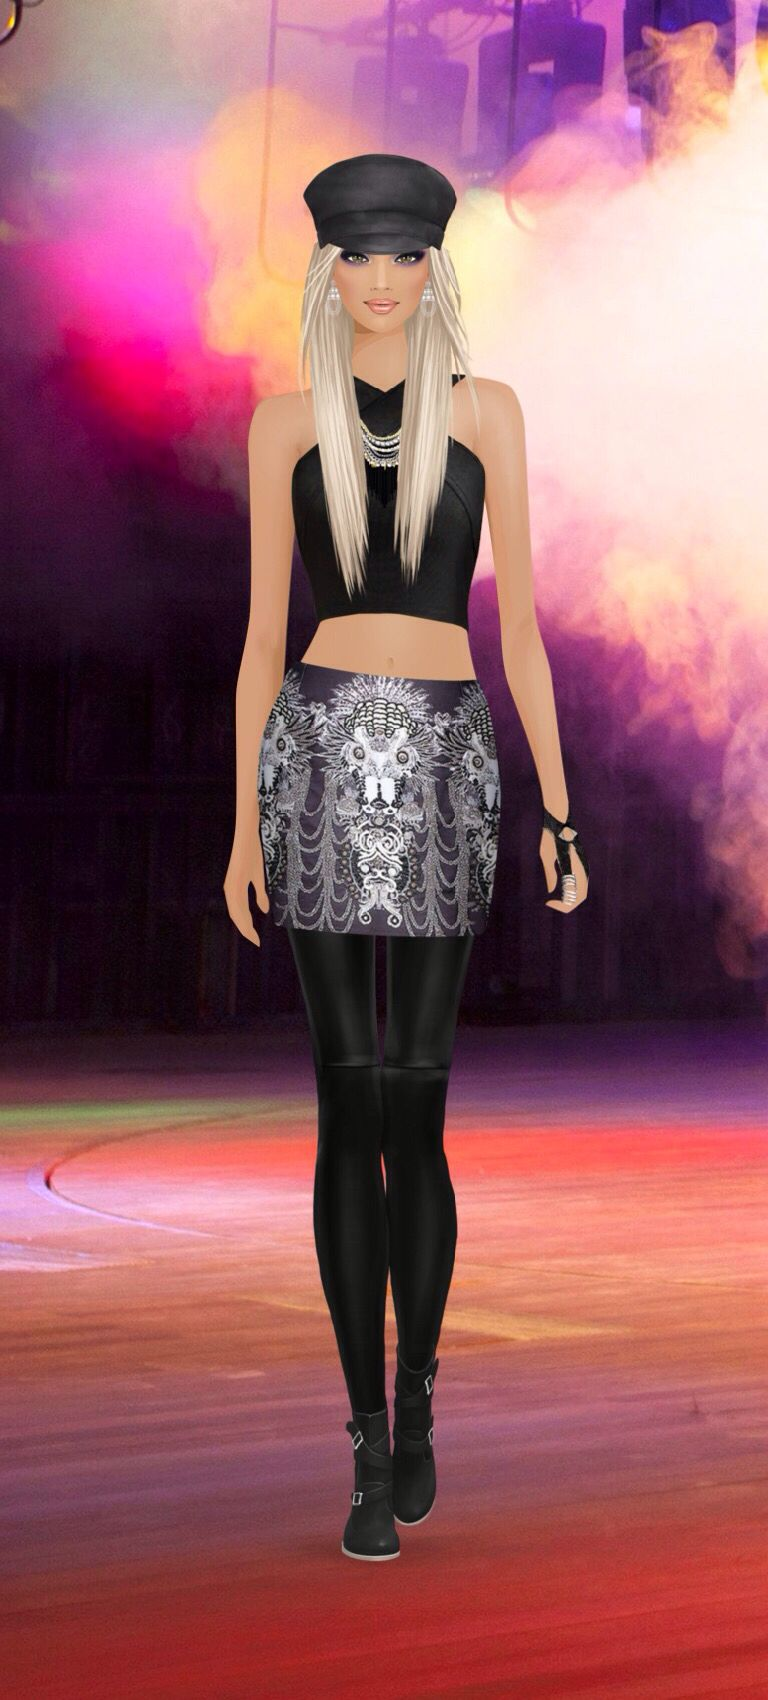 Rock Star 39 S Girlfriend Covet Fashion Pinterest Girlfriends And Covet Fashion